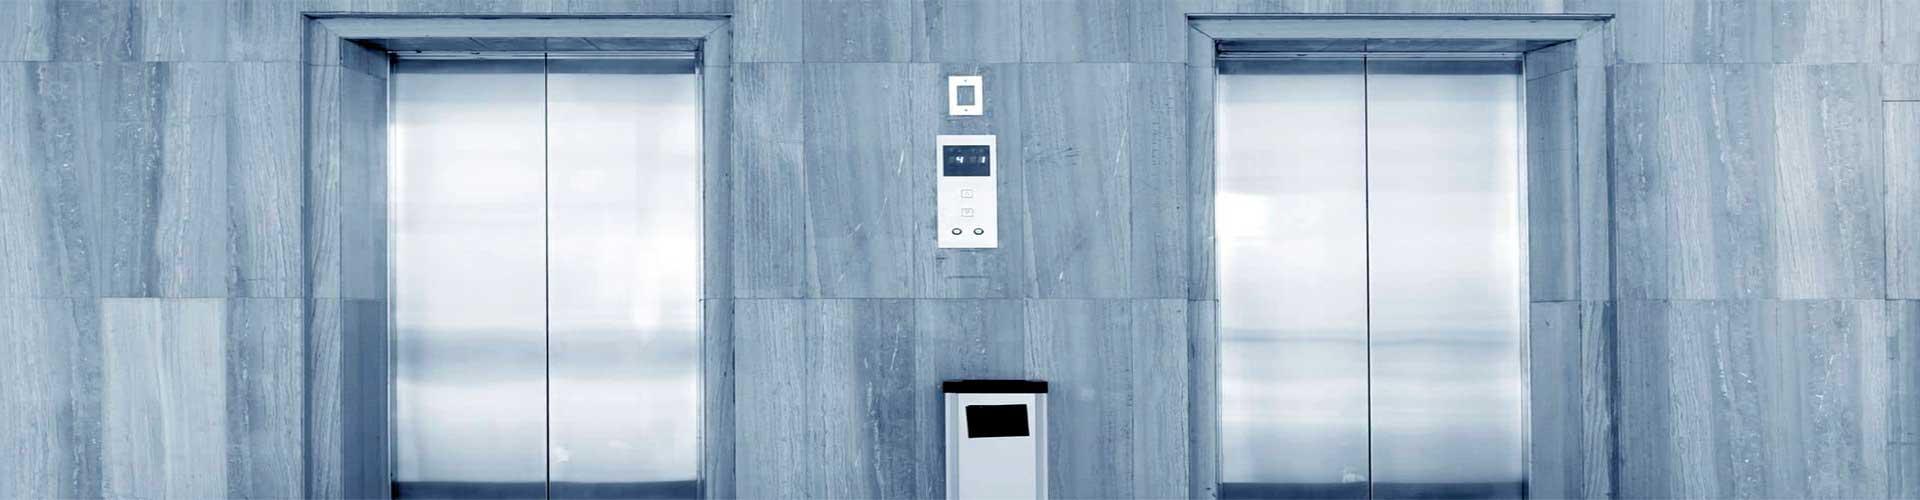 instalar ascensor en comunidad